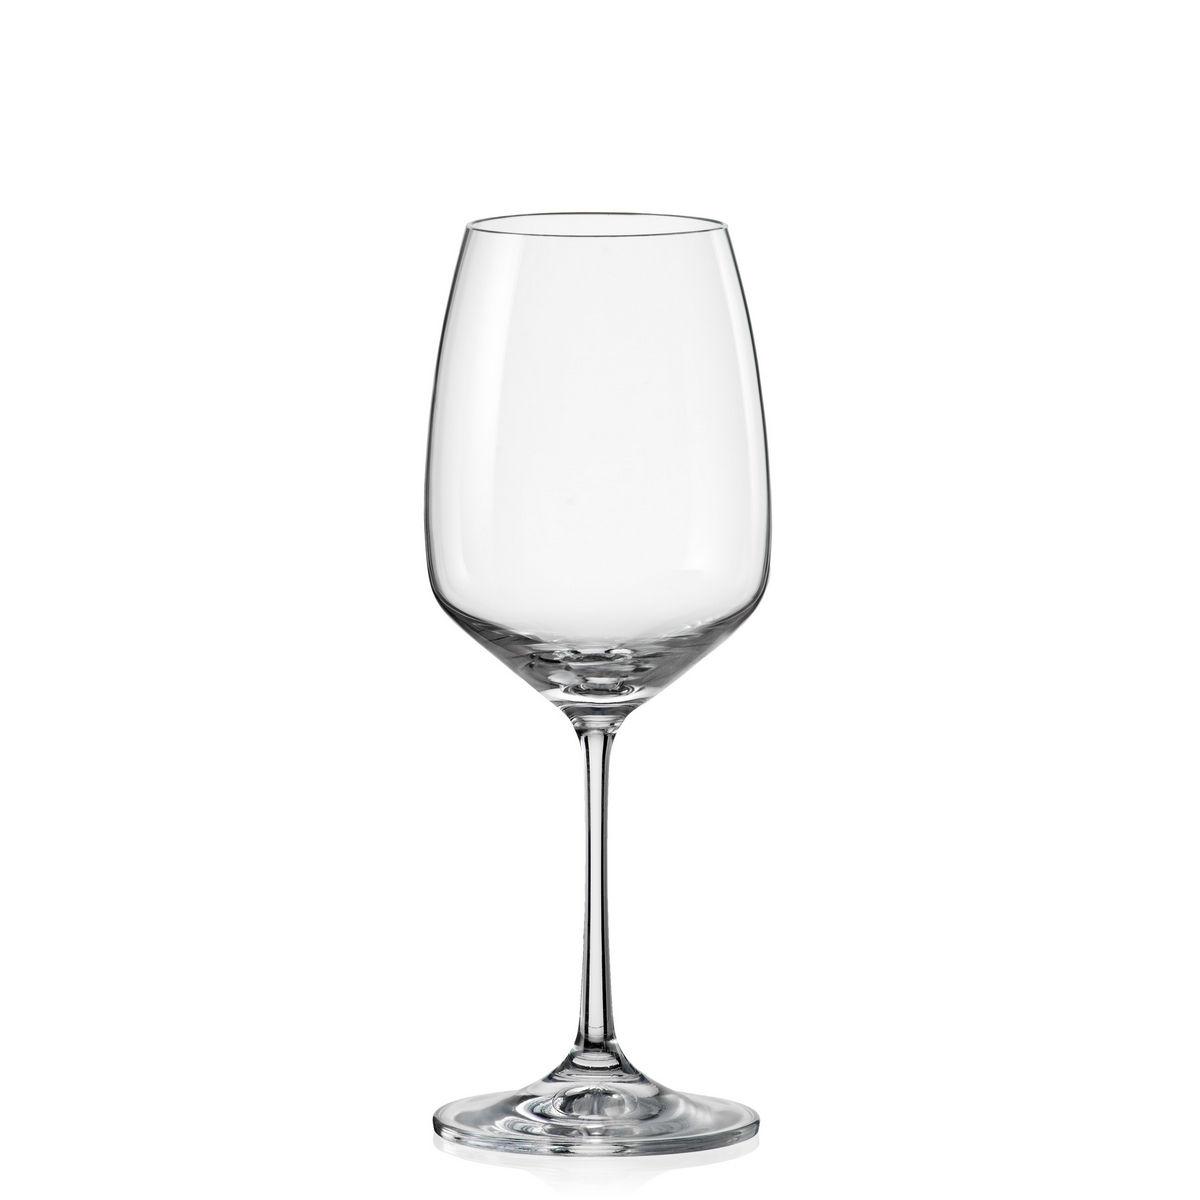 GISELLE Set 6 pahare cristalin vin 455 ml